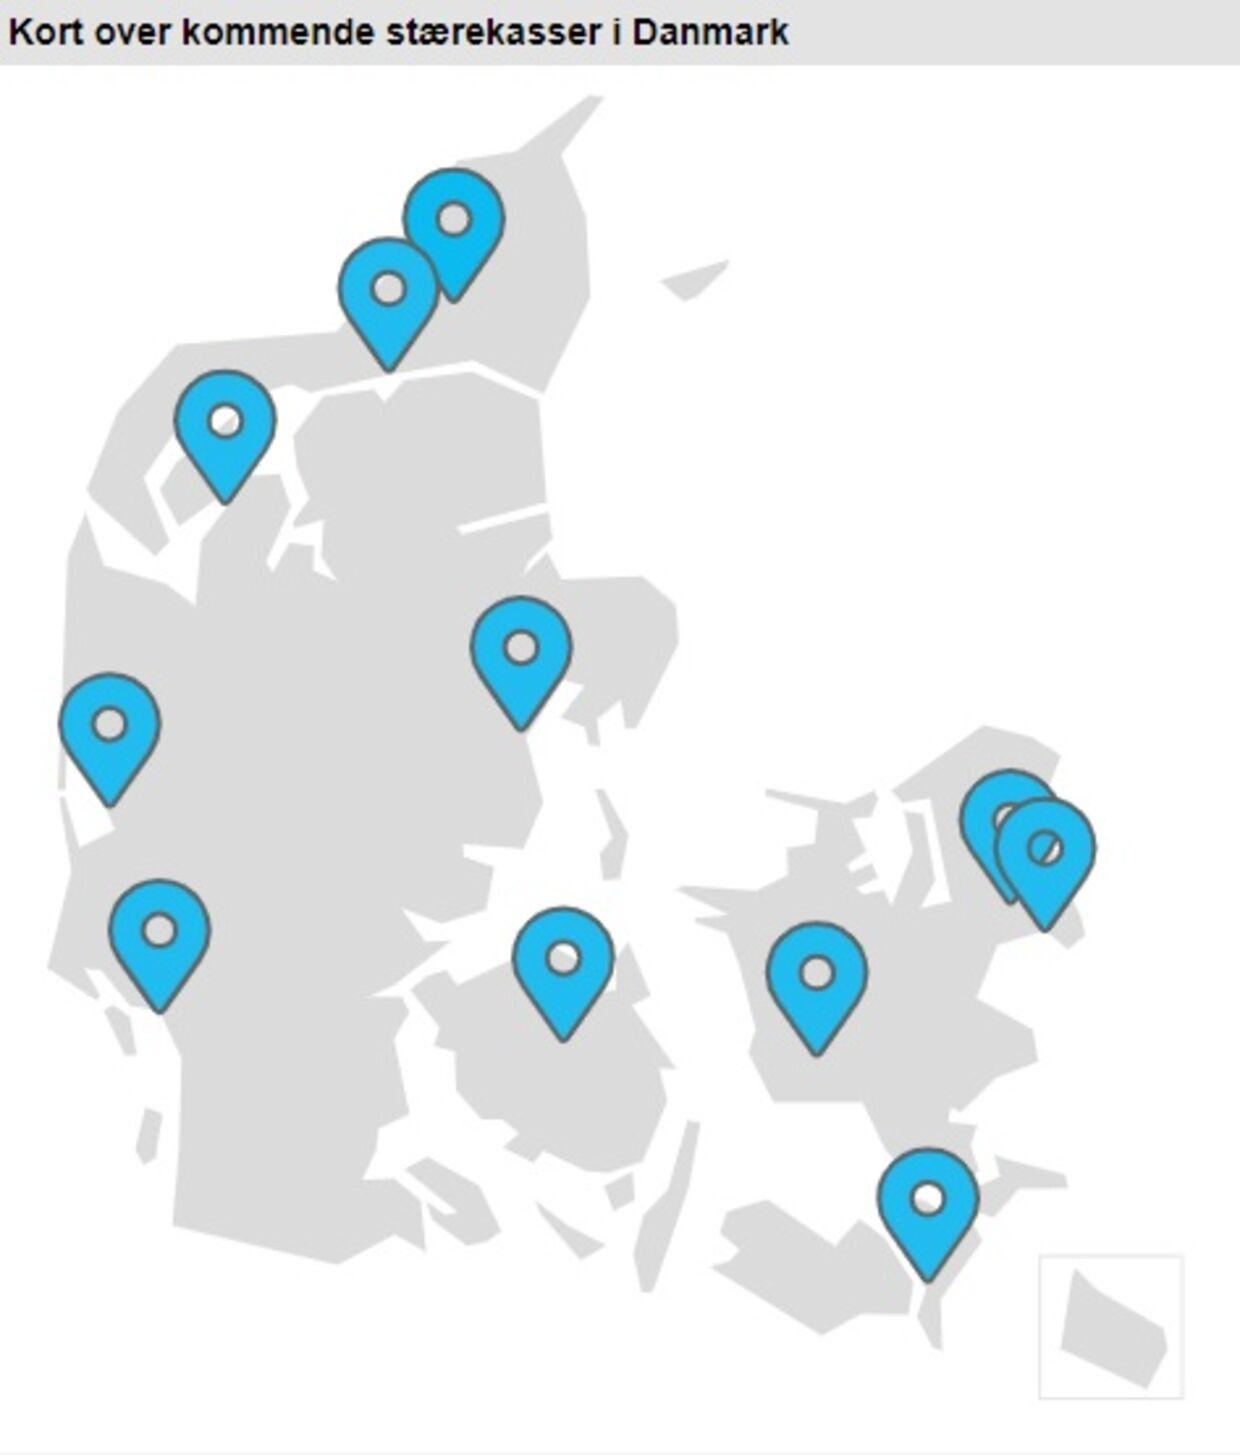 Tirsdag Startes Danmarks Forste Permanente Fartkontrol Bt Krimi